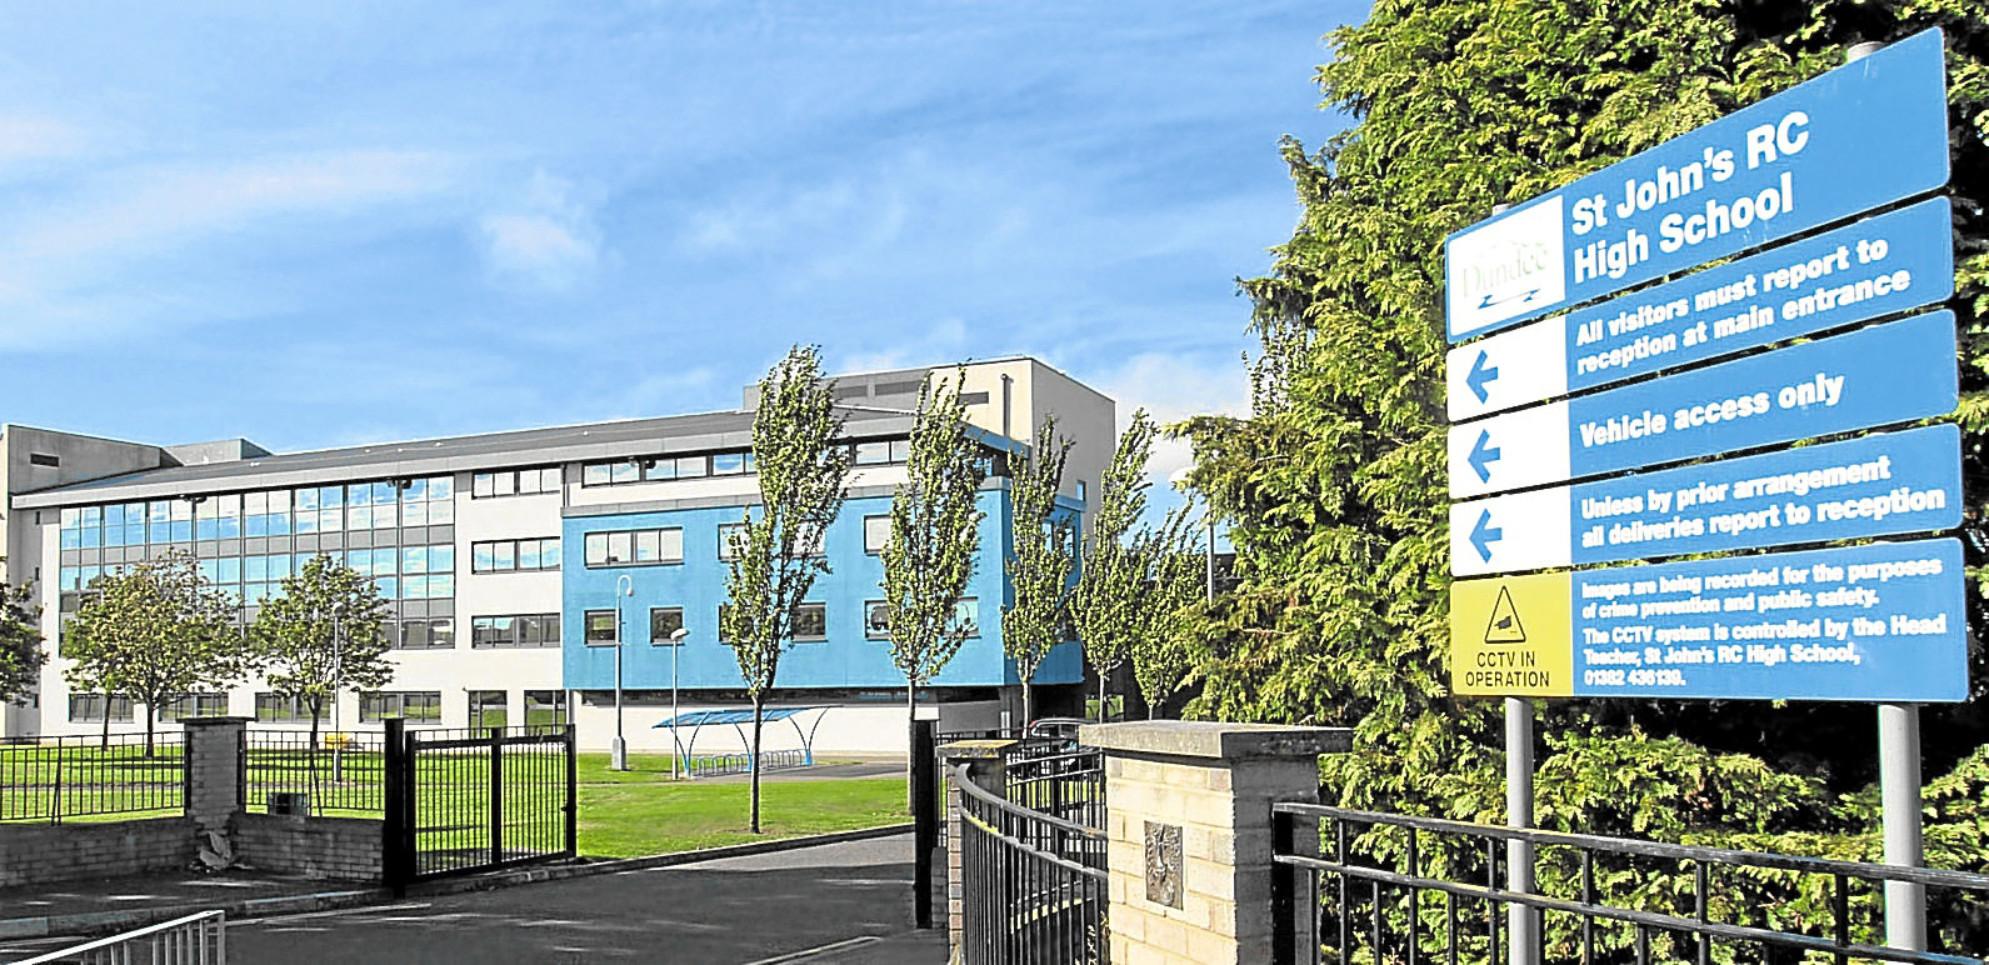 St John's RC High School.